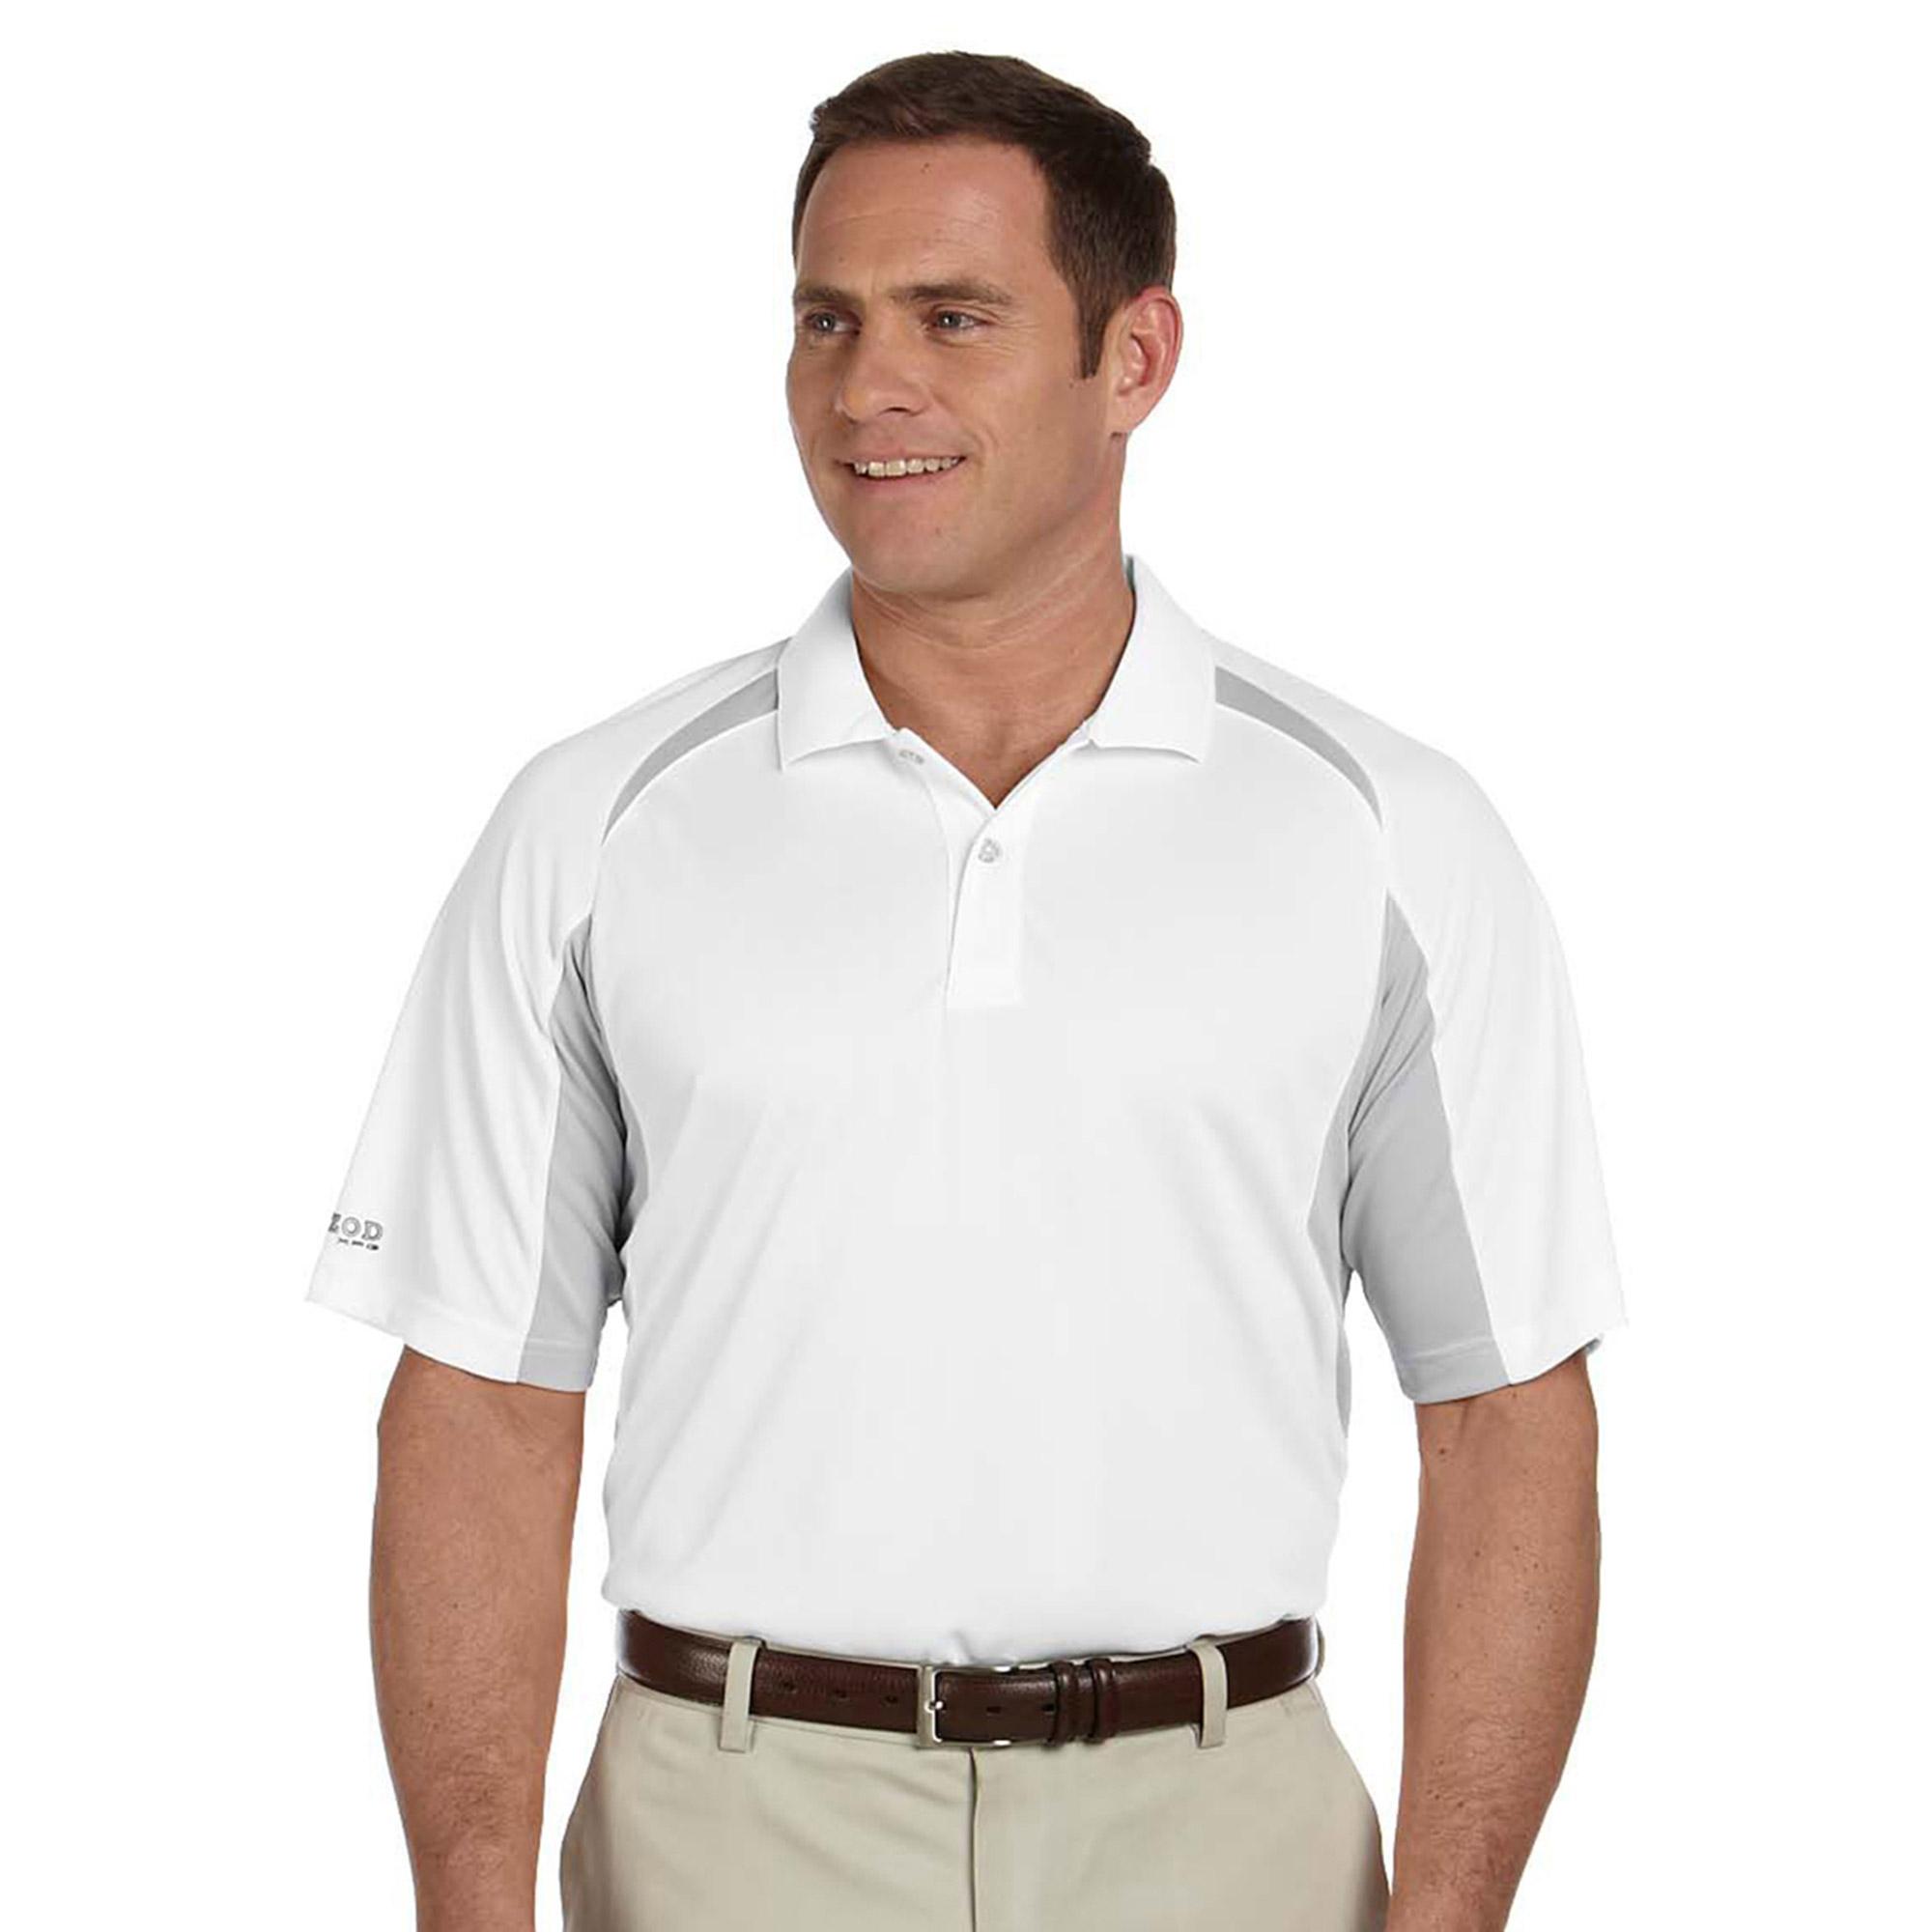 Izod Men's Contrast Performance Dobby Polo Shirt